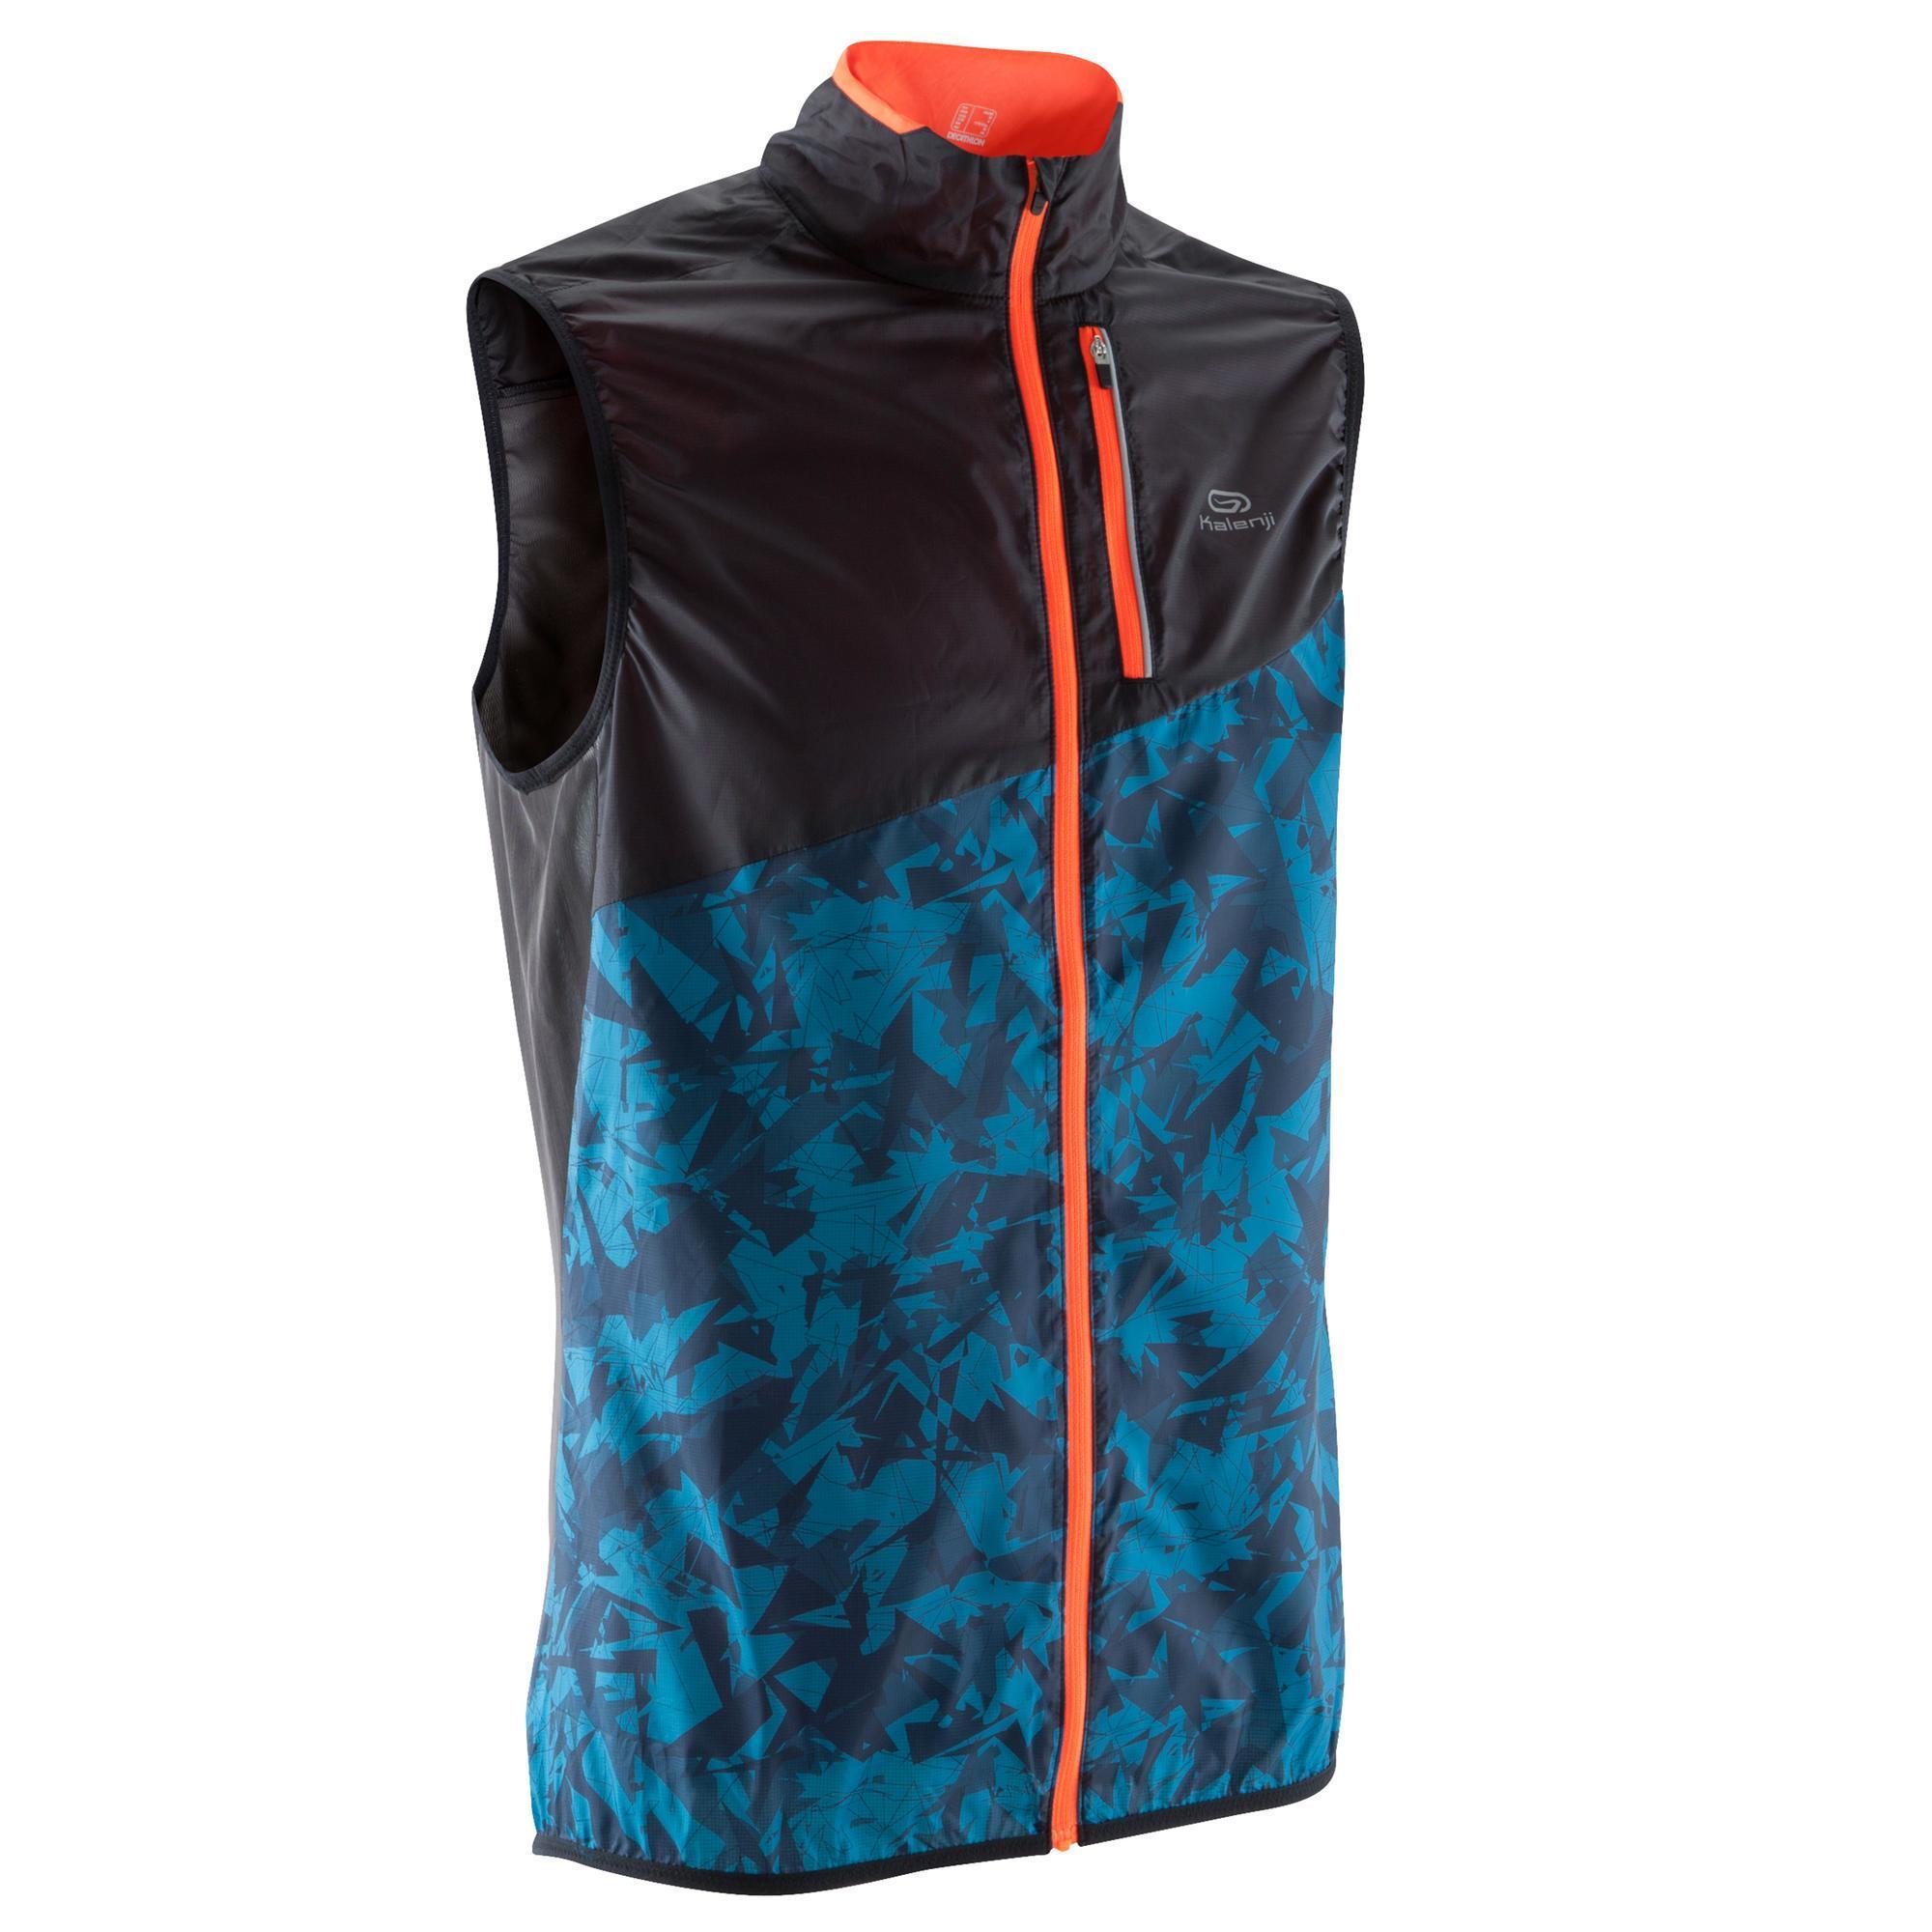 veste sans manche coupe vent trail running homme noir bleu kalenji. Black Bedroom Furniture Sets. Home Design Ideas